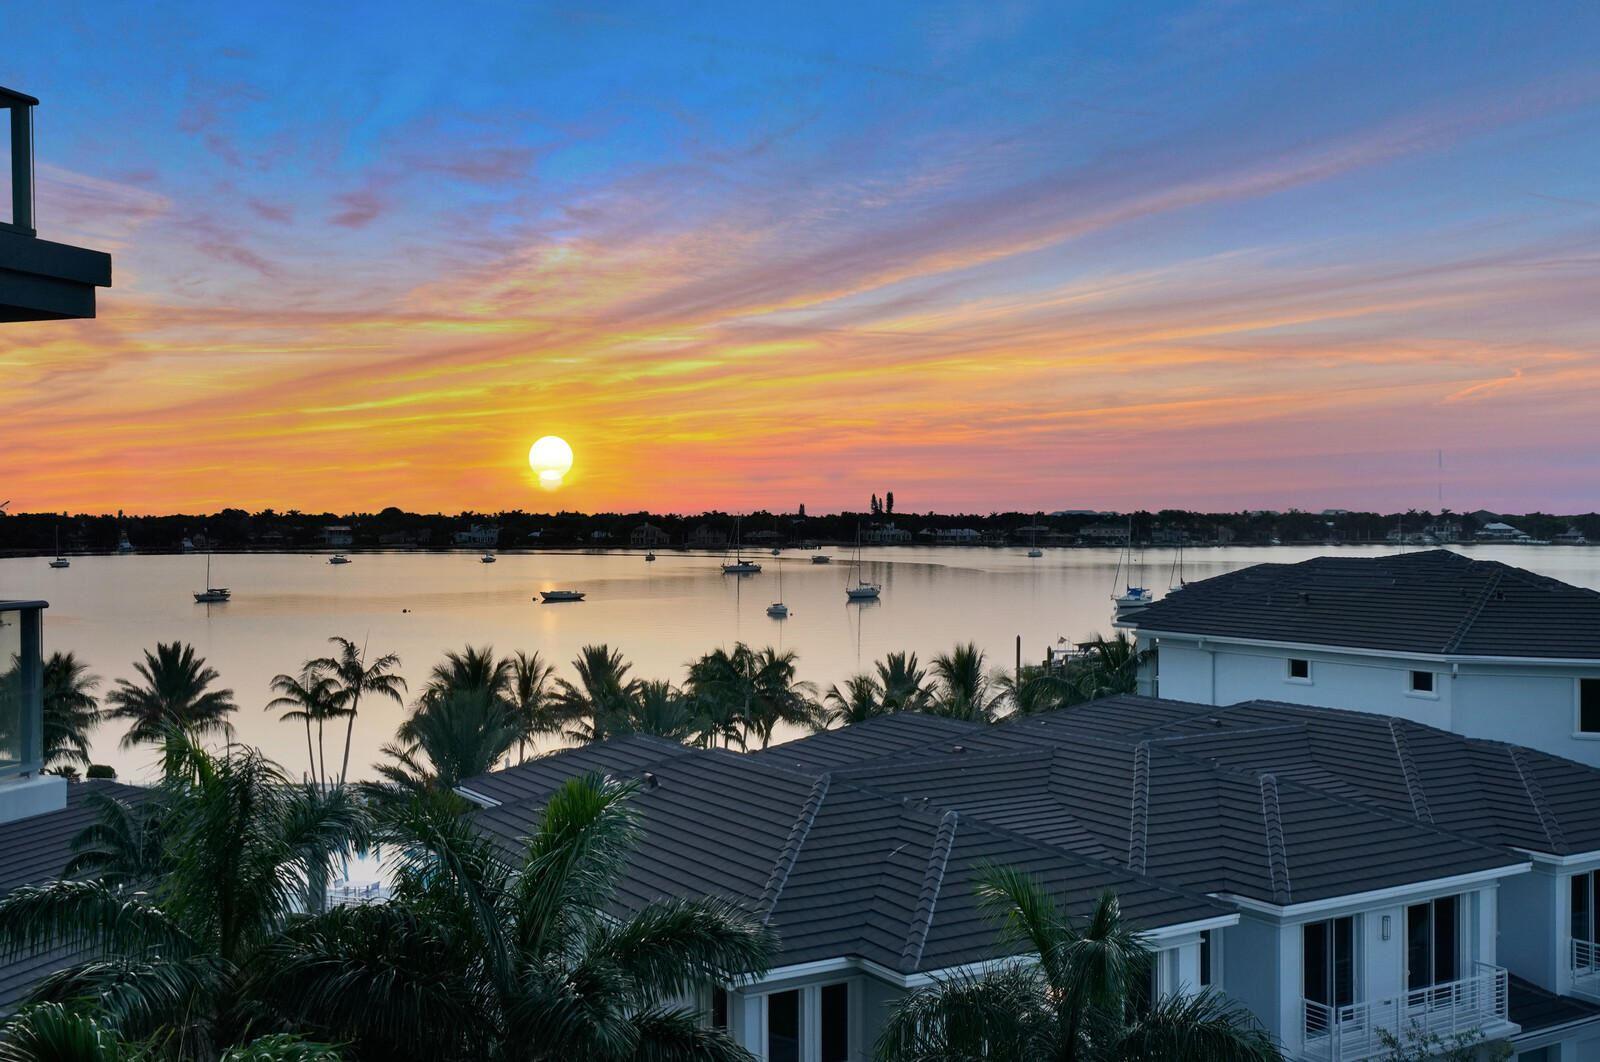 Photo of 2 Water Club Way #504, North Palm Beach, FL 33408 (MLS # RX-10633575)